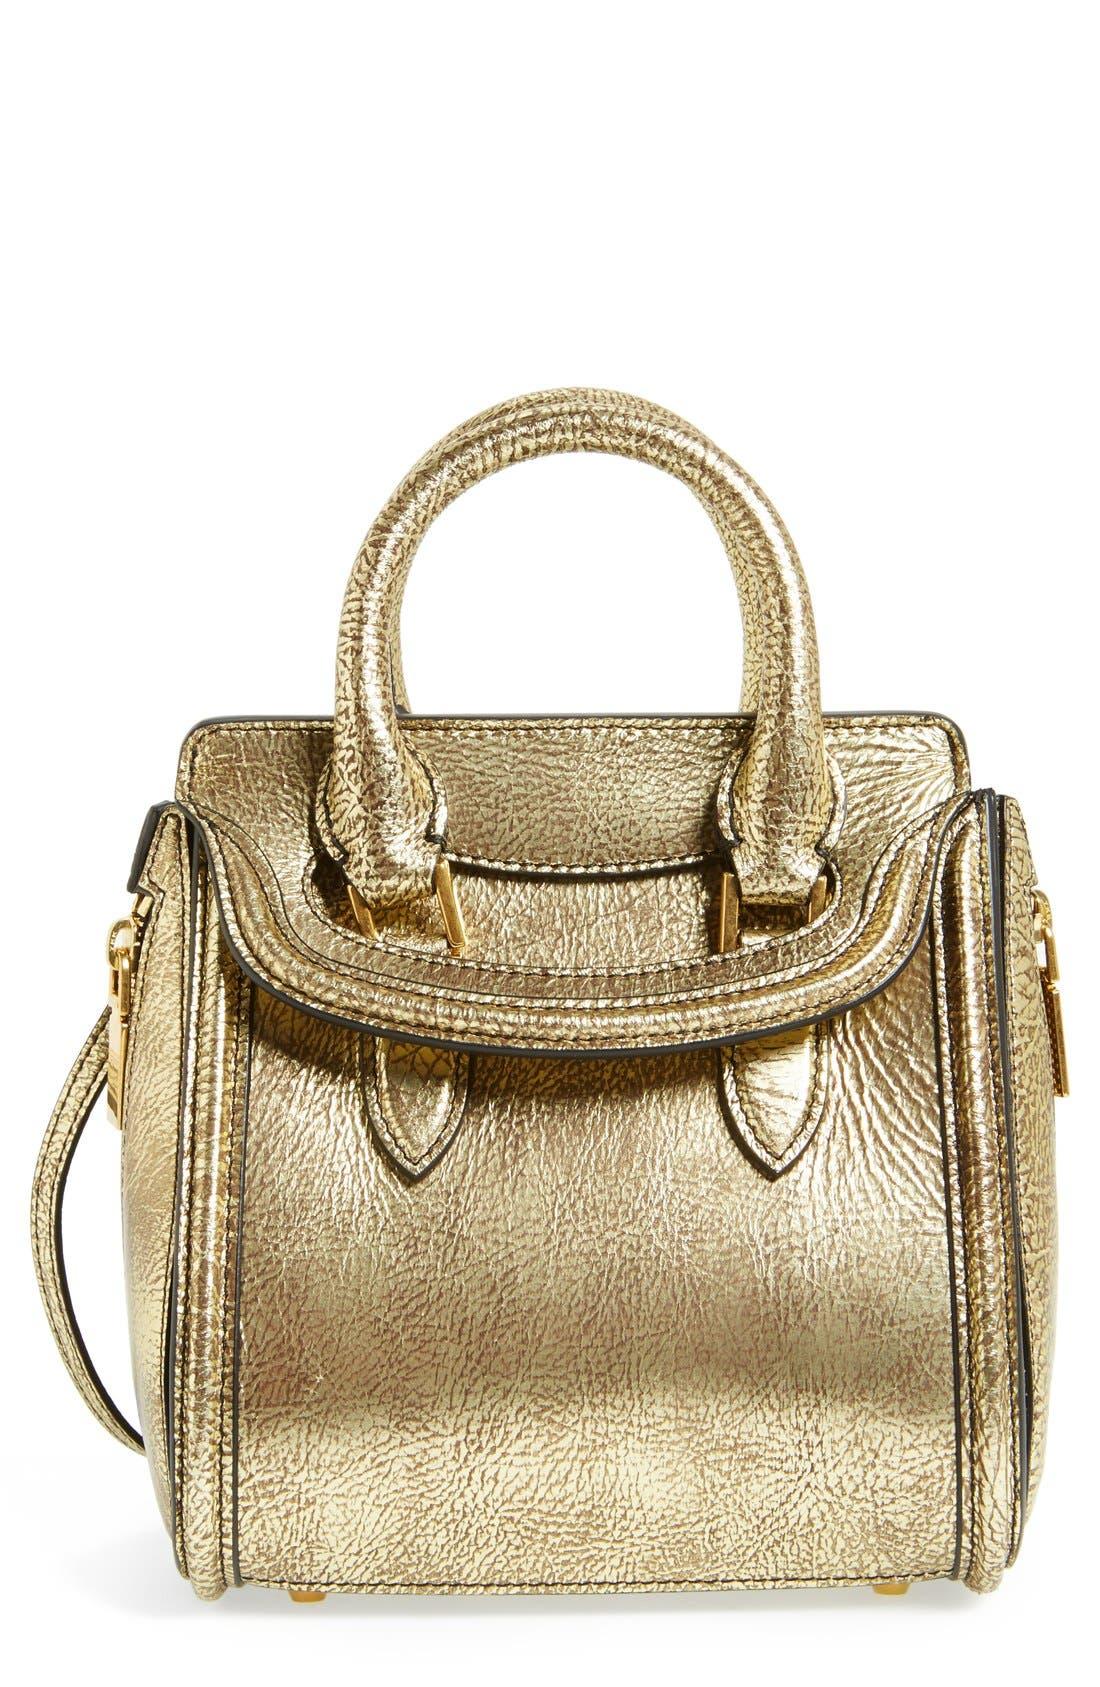 Alternate Image 1 Selected - Alexander McQueen 'Mini Heroine' Metallic Lambskin Leather Crossbody Bag